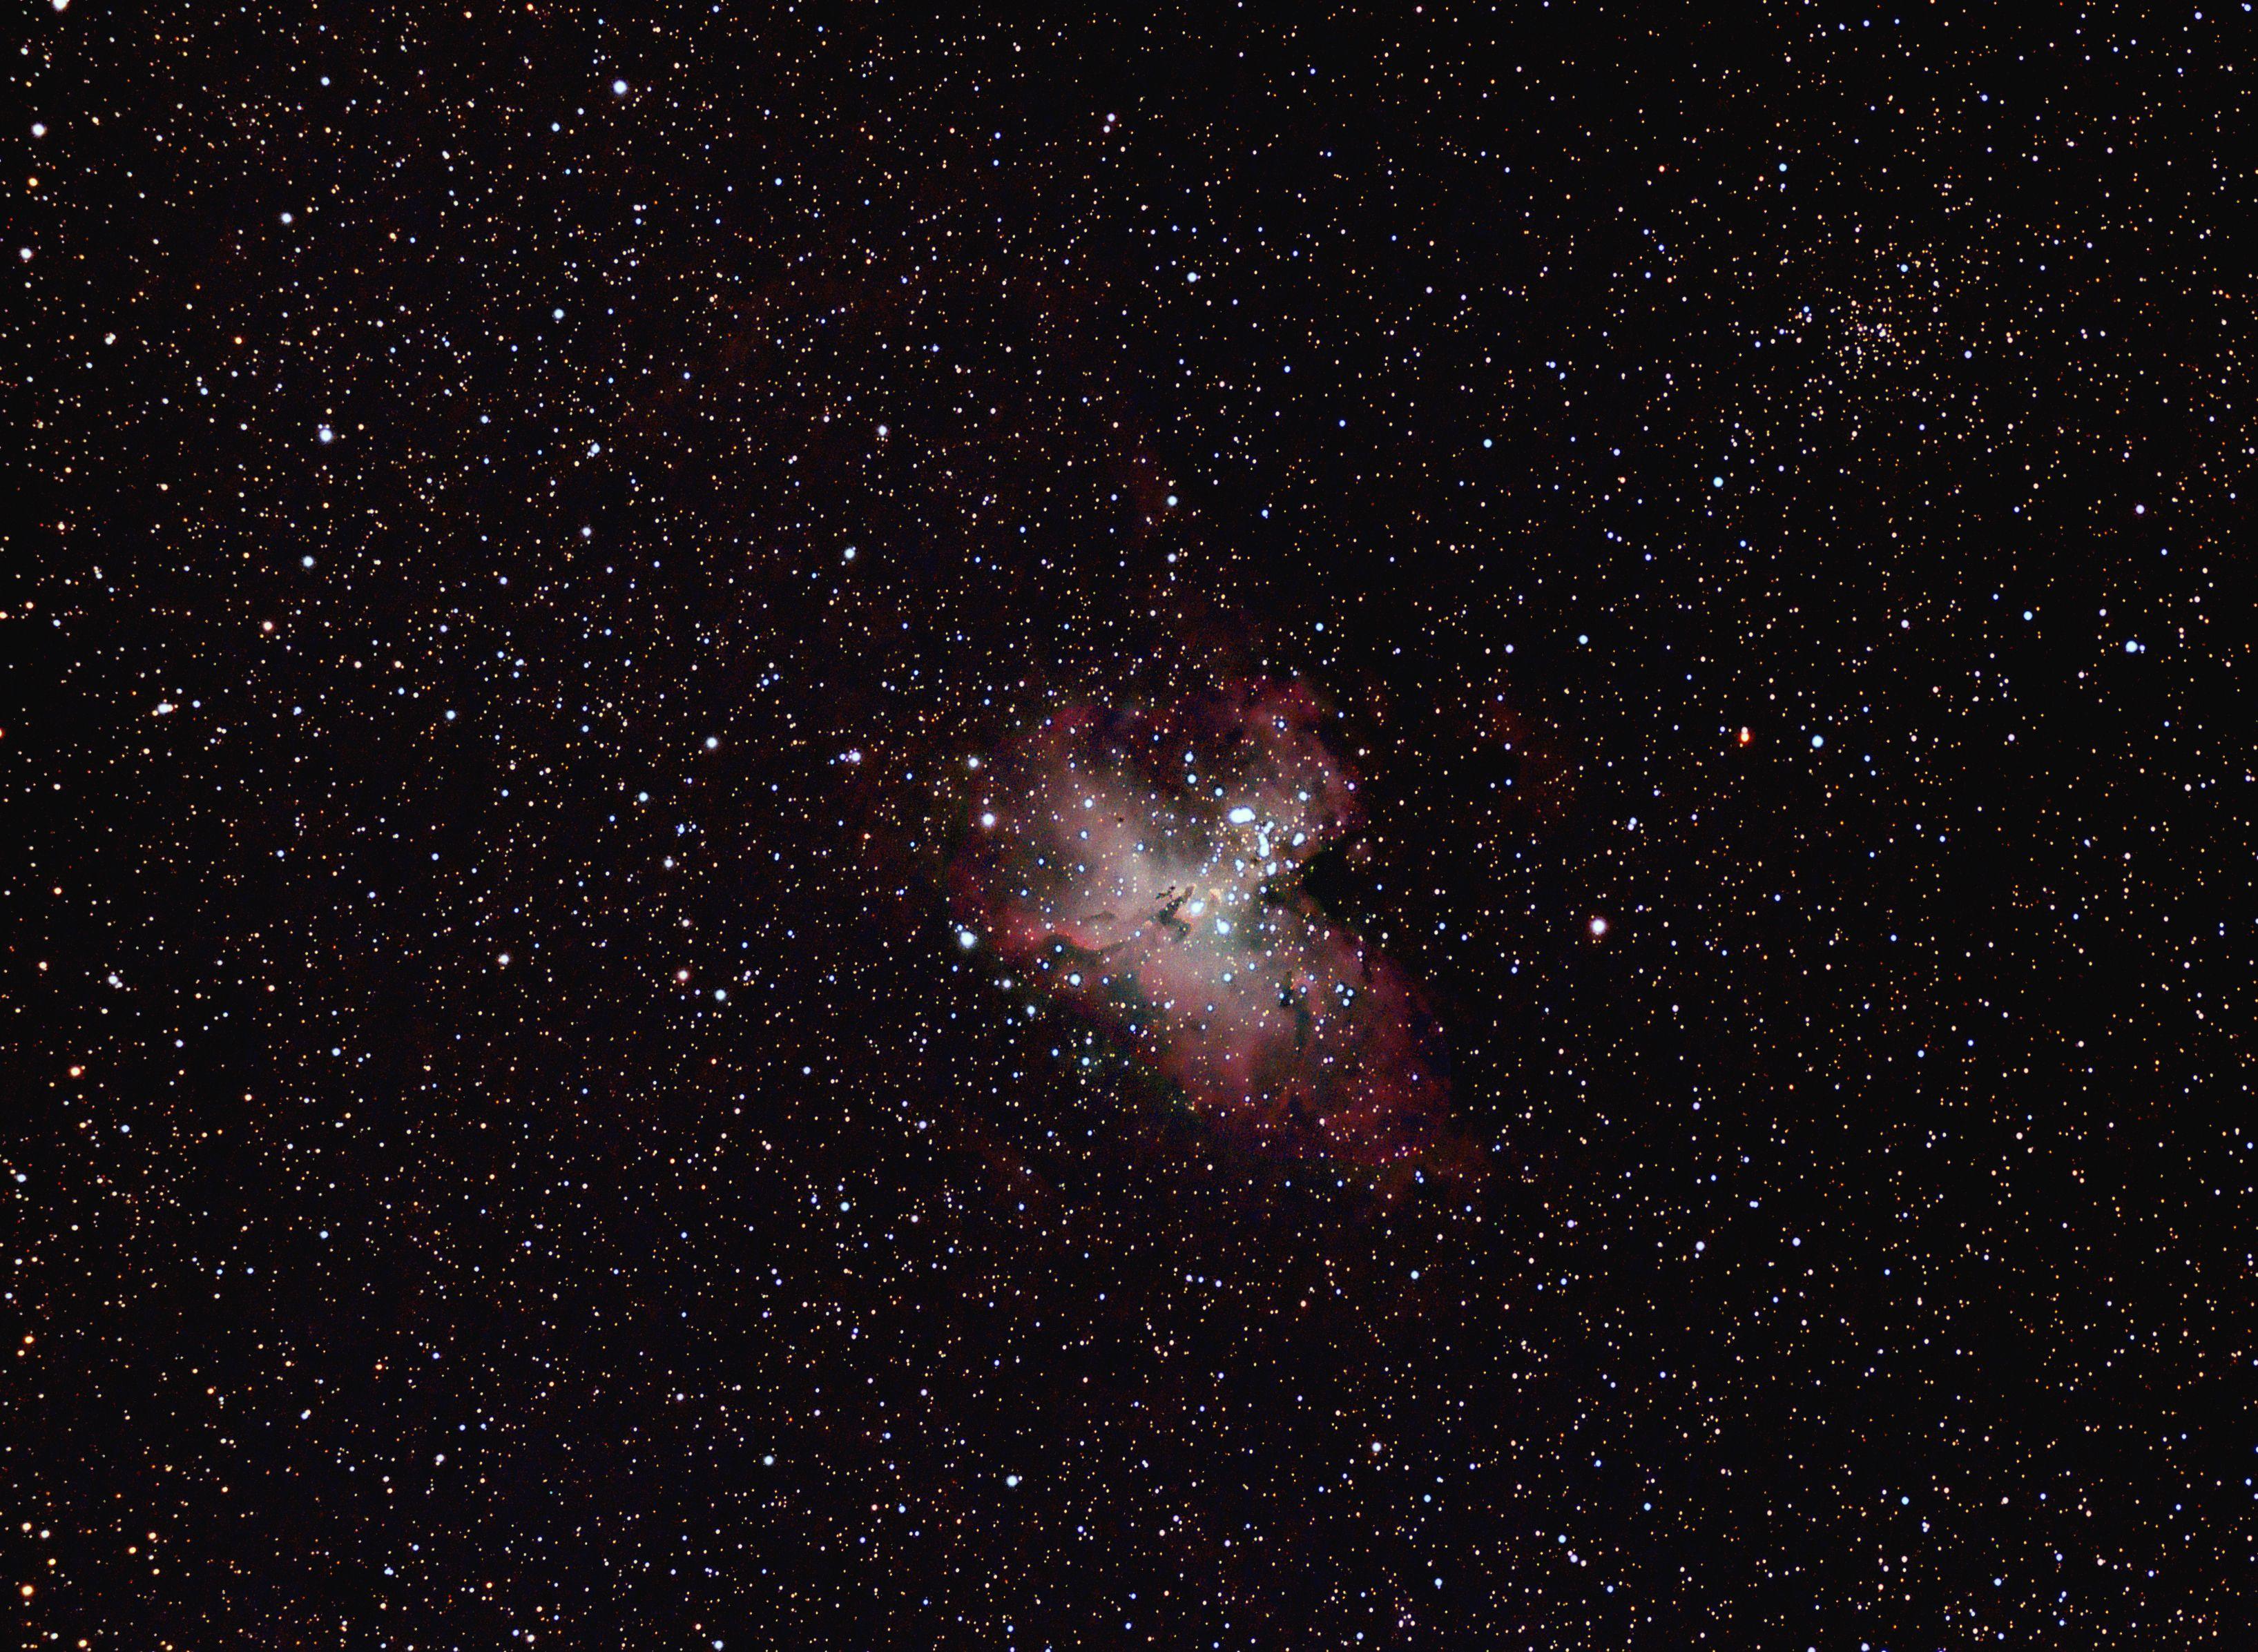 M16 (Eagle Nebula)